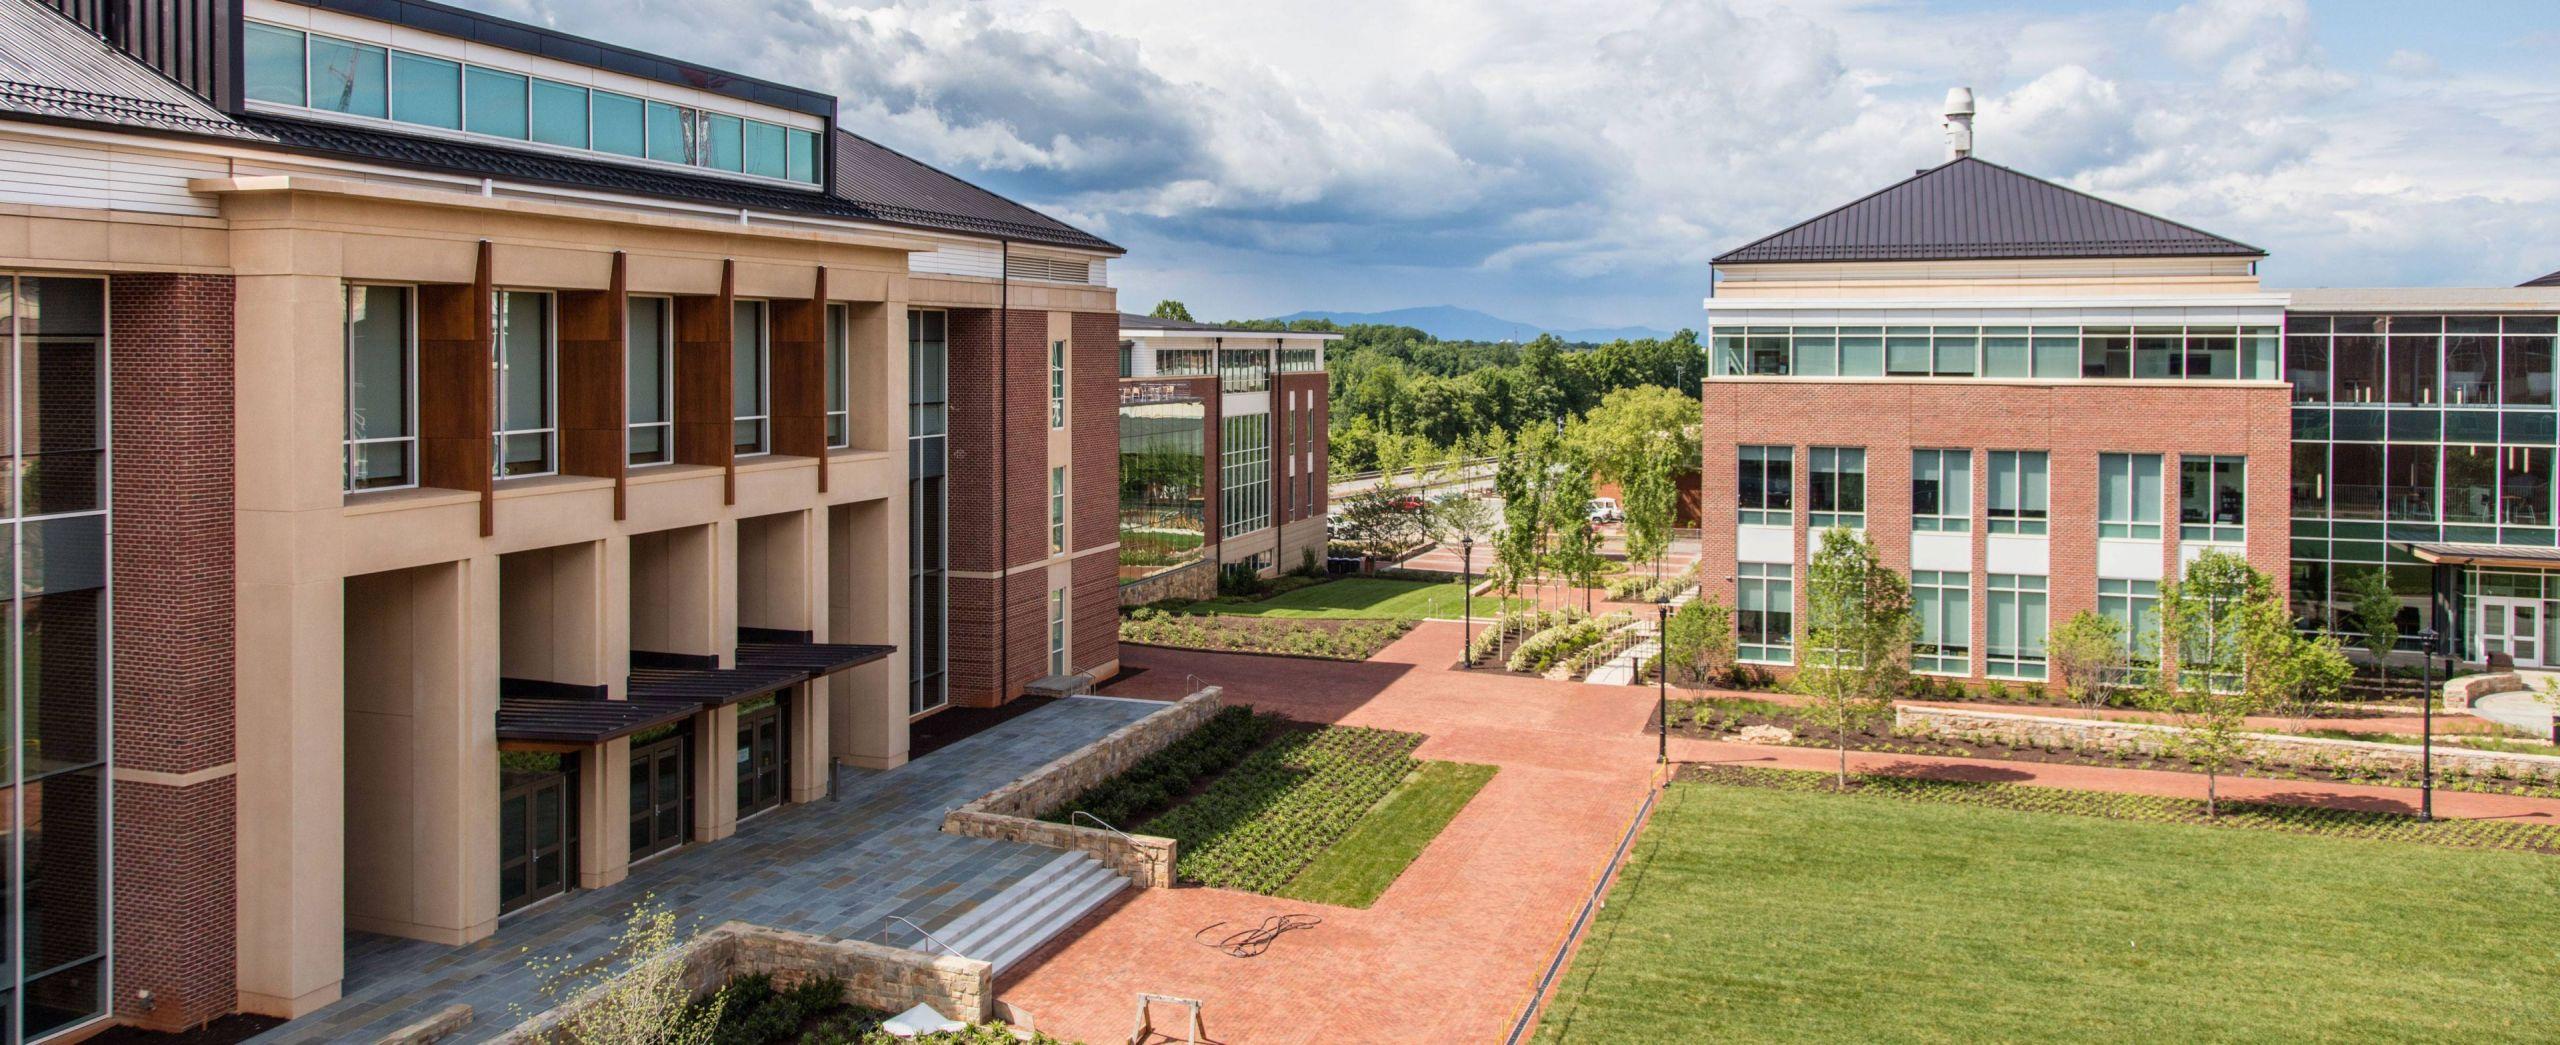 Liberty University Admissions